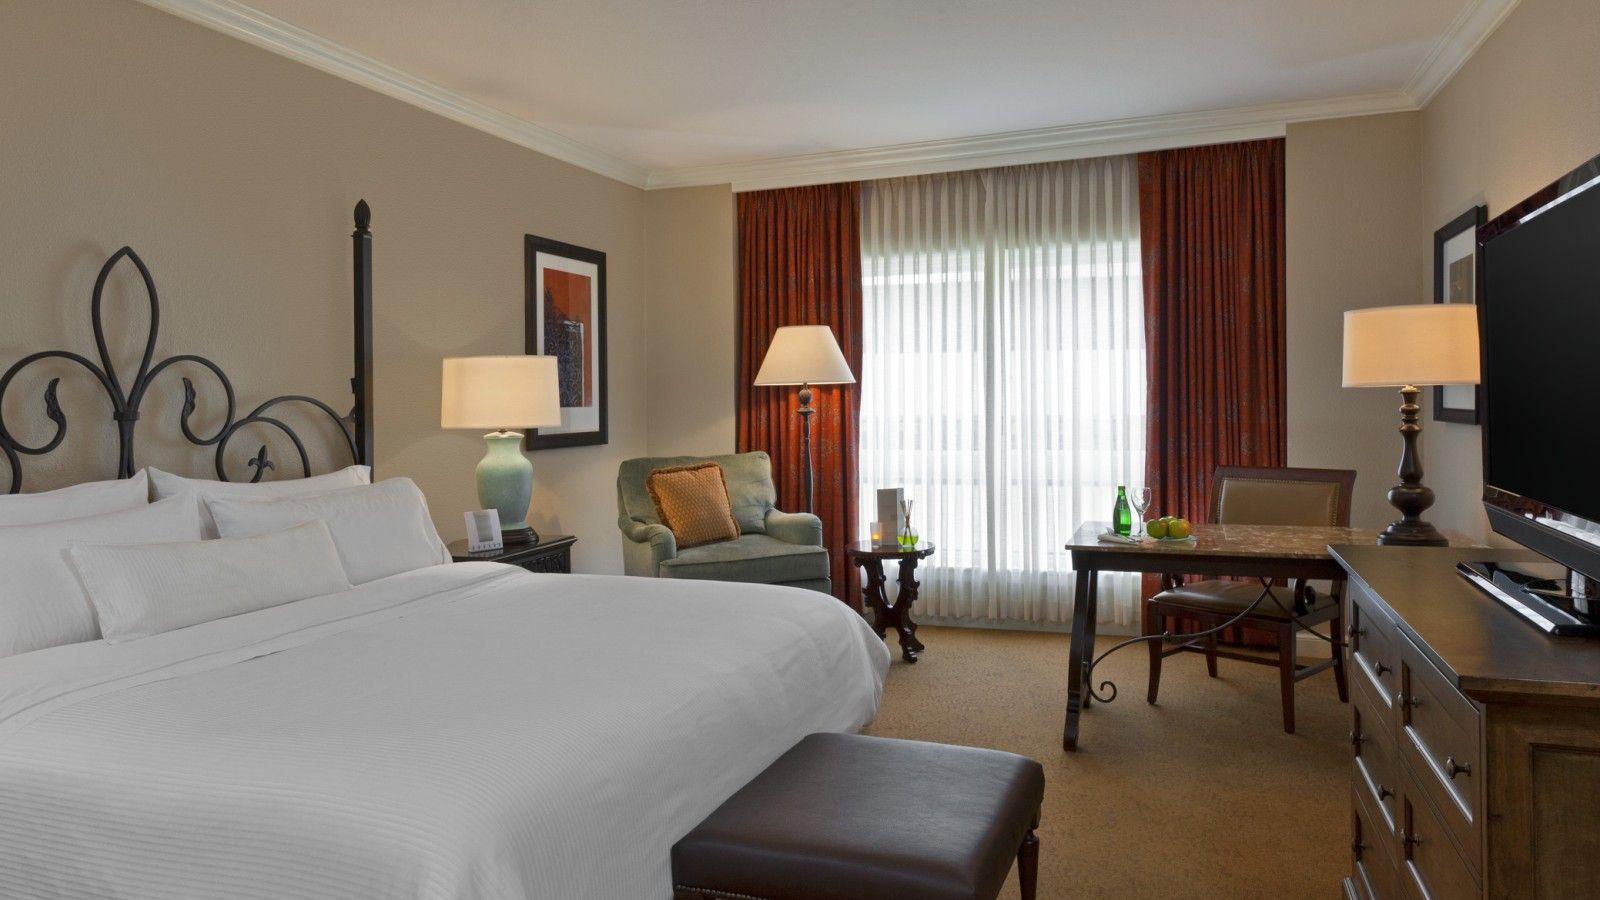 The Westin Riverwalk Hotel San Antonio Spa Room Spa rooms